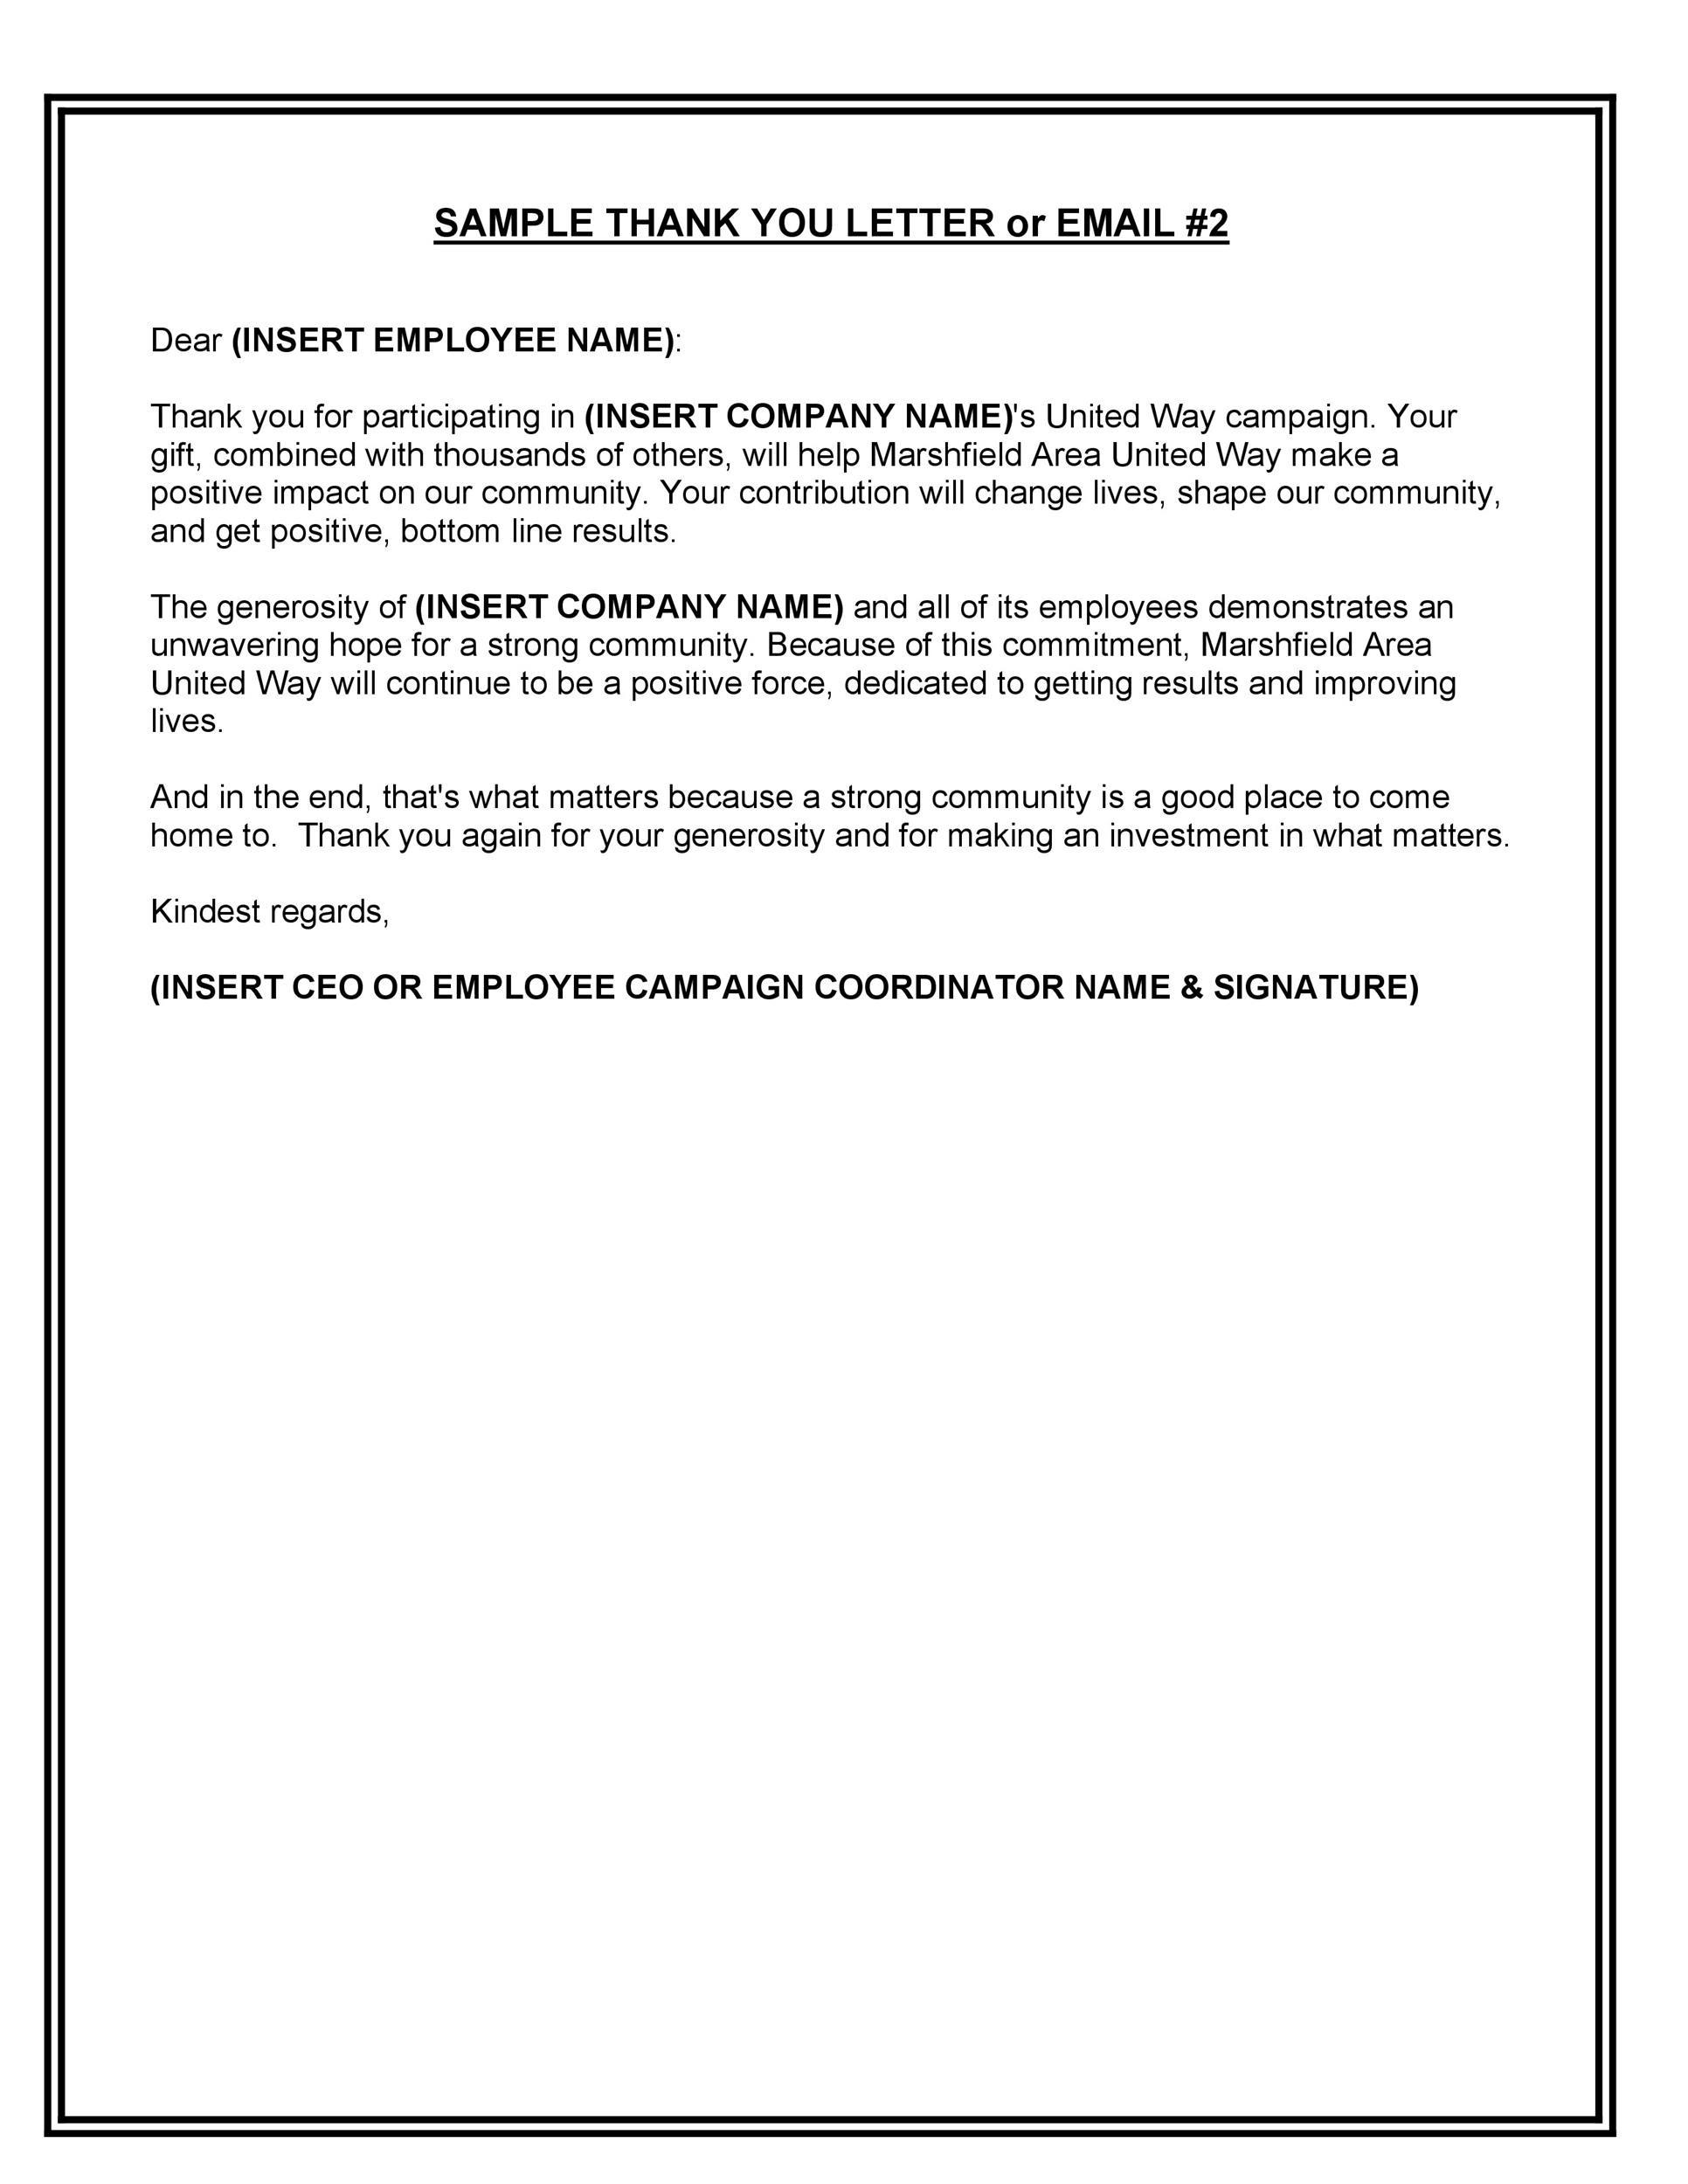 Corporate Template Sponsorship Form Renewal